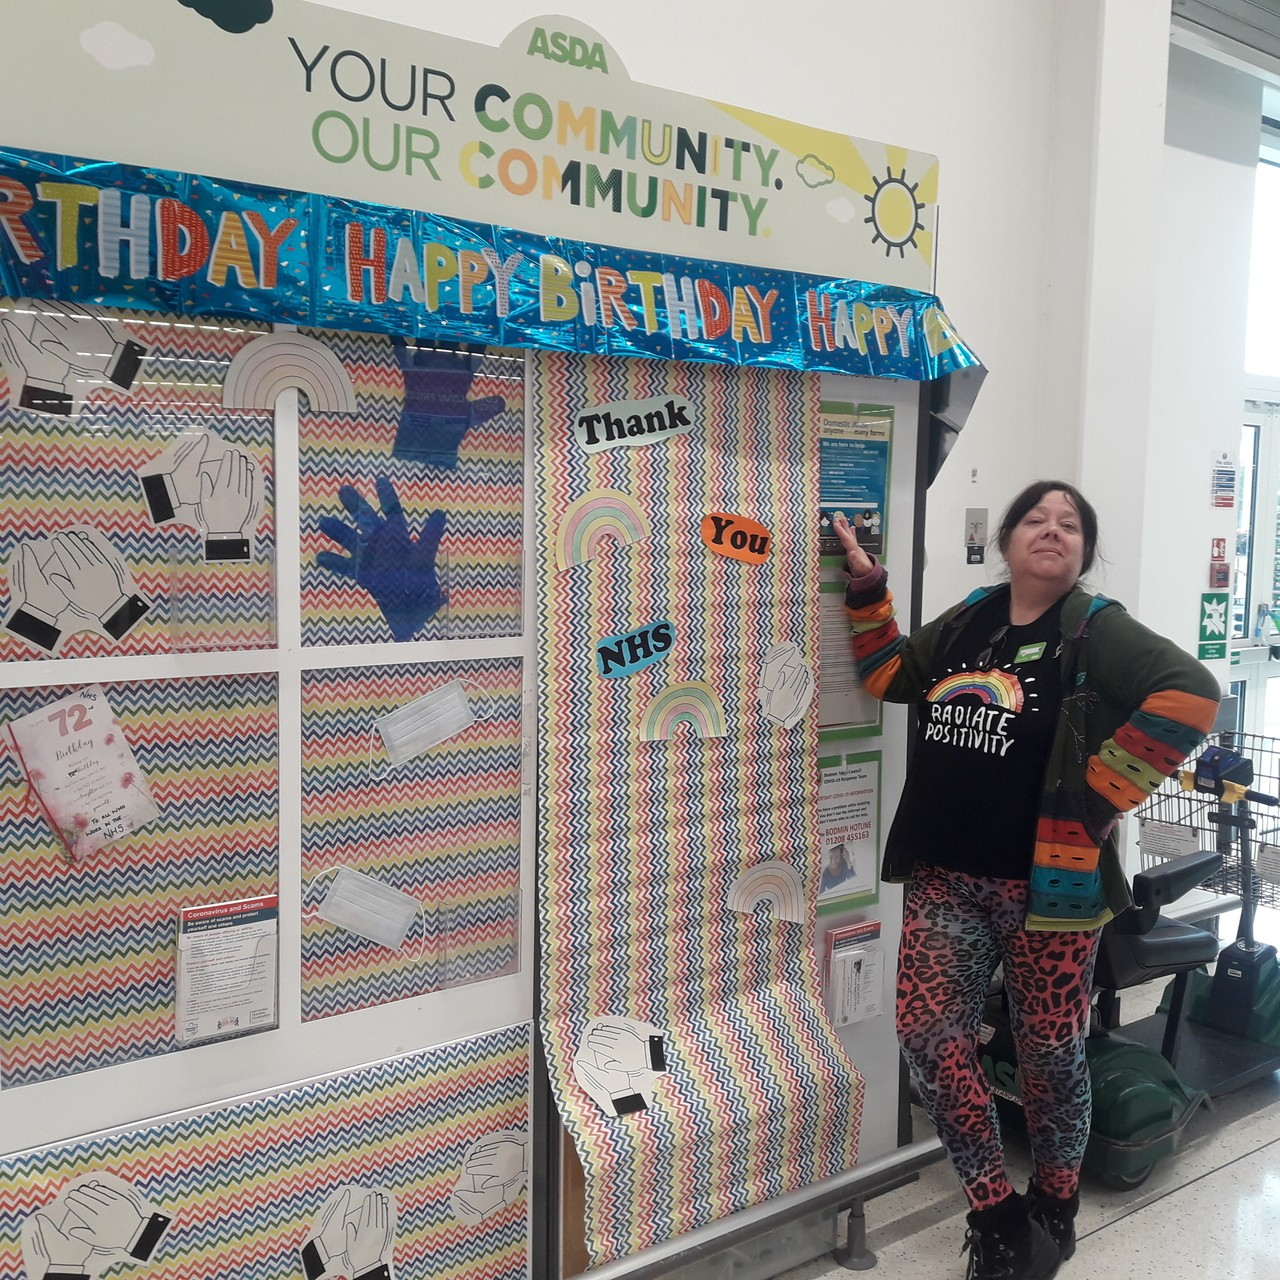 Happy birthday to the NHS | Asda Bodmin